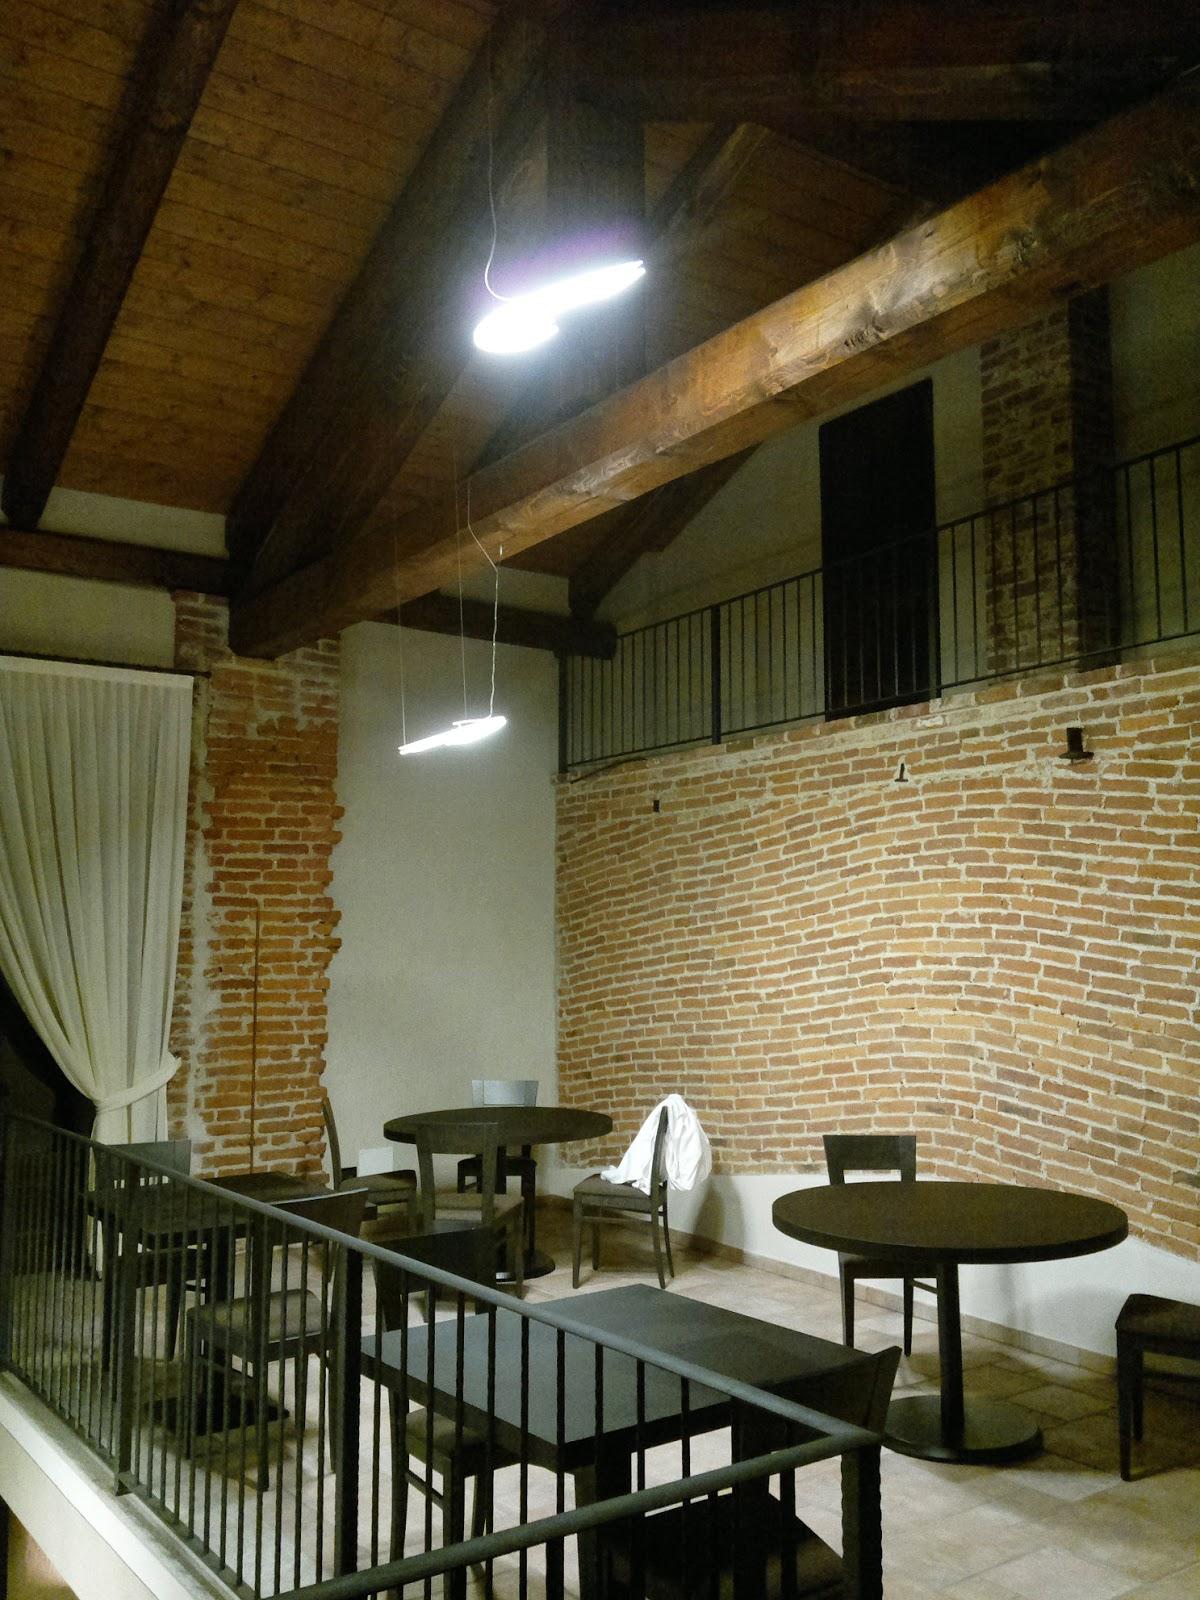 Illuminazione Led casa: lluminare a Led una mansarda ...